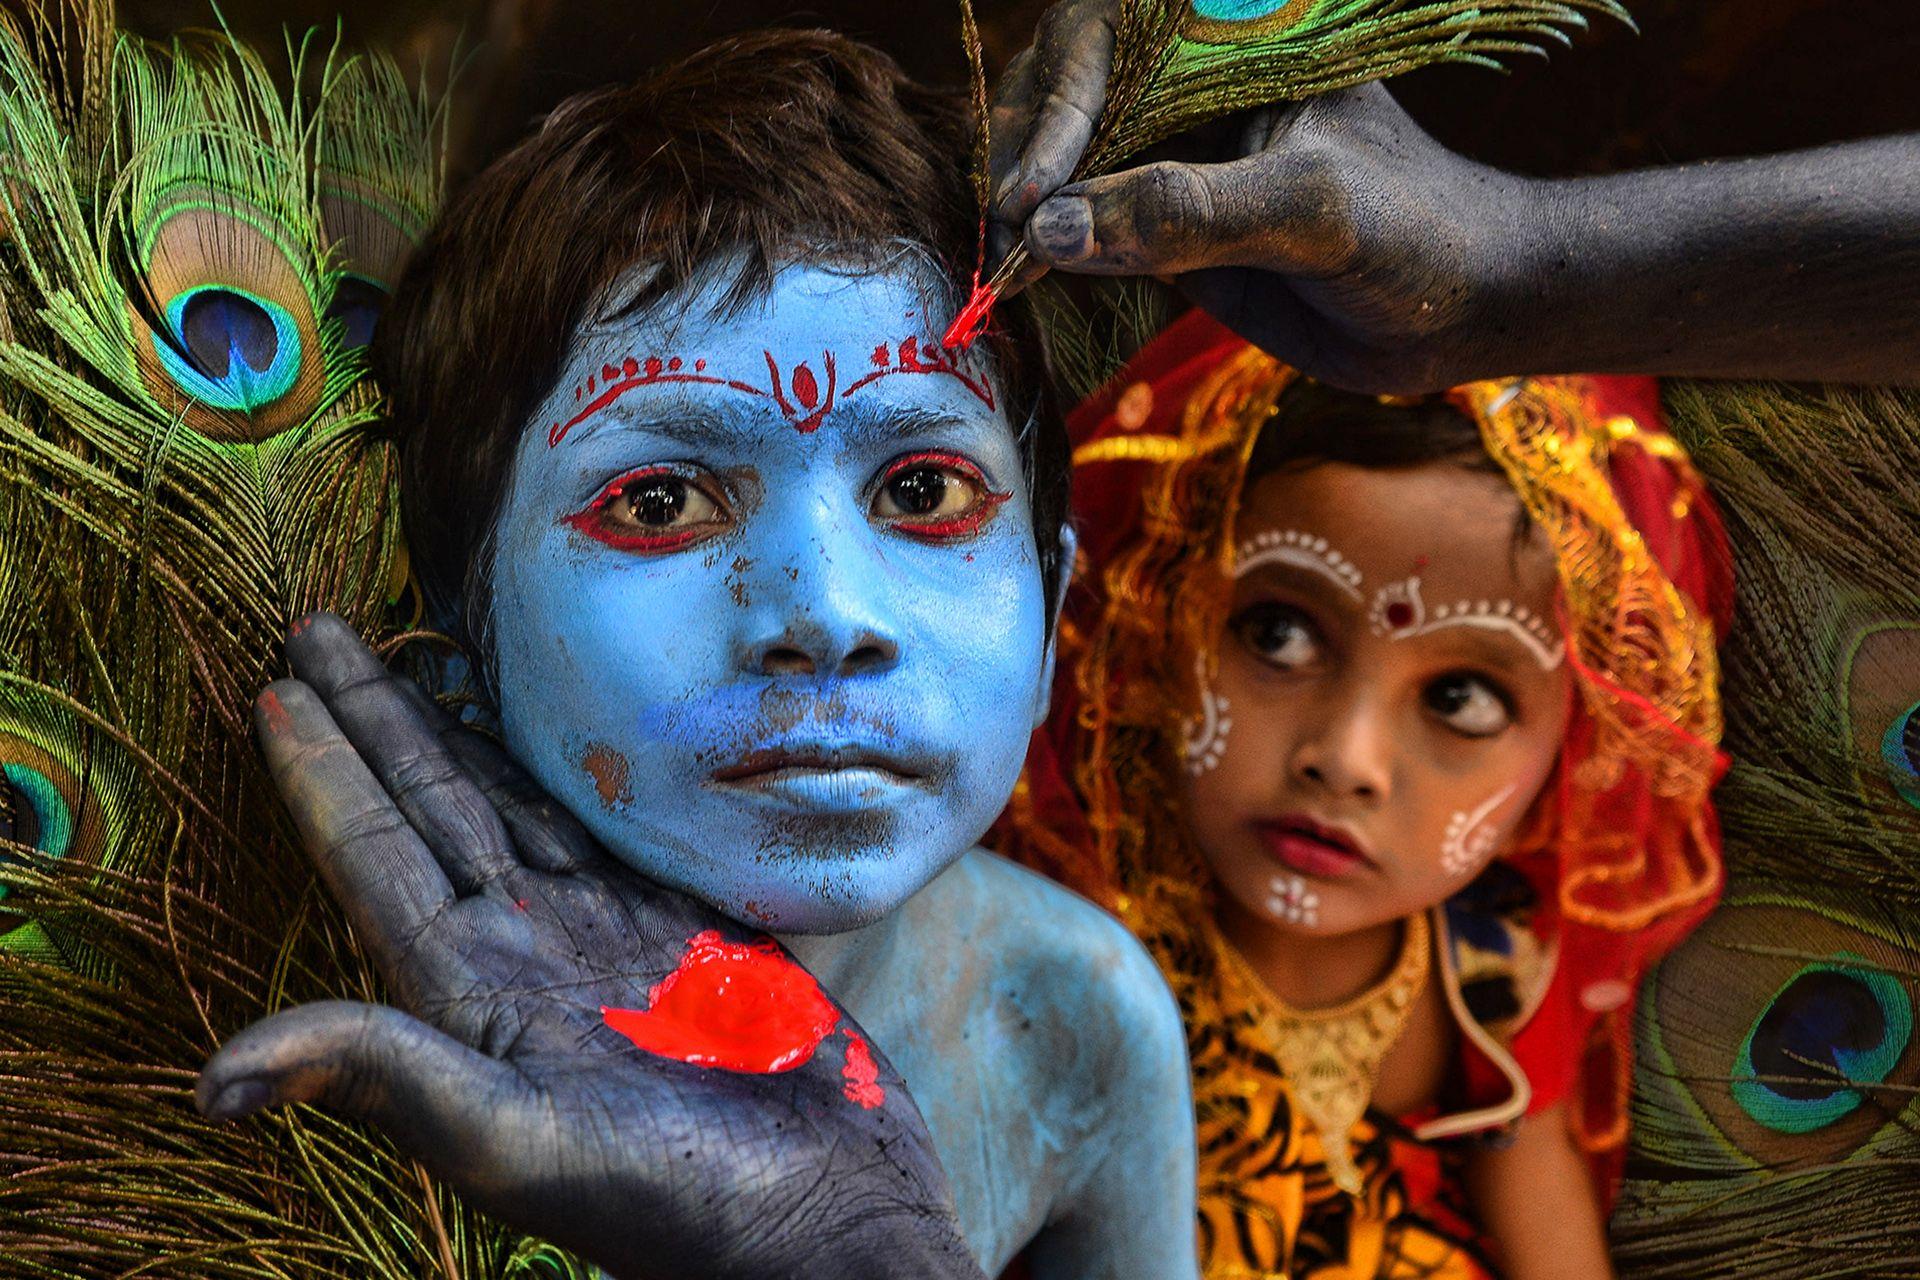 Boy painted as Krishna in India © Sanghamitra Sarkar